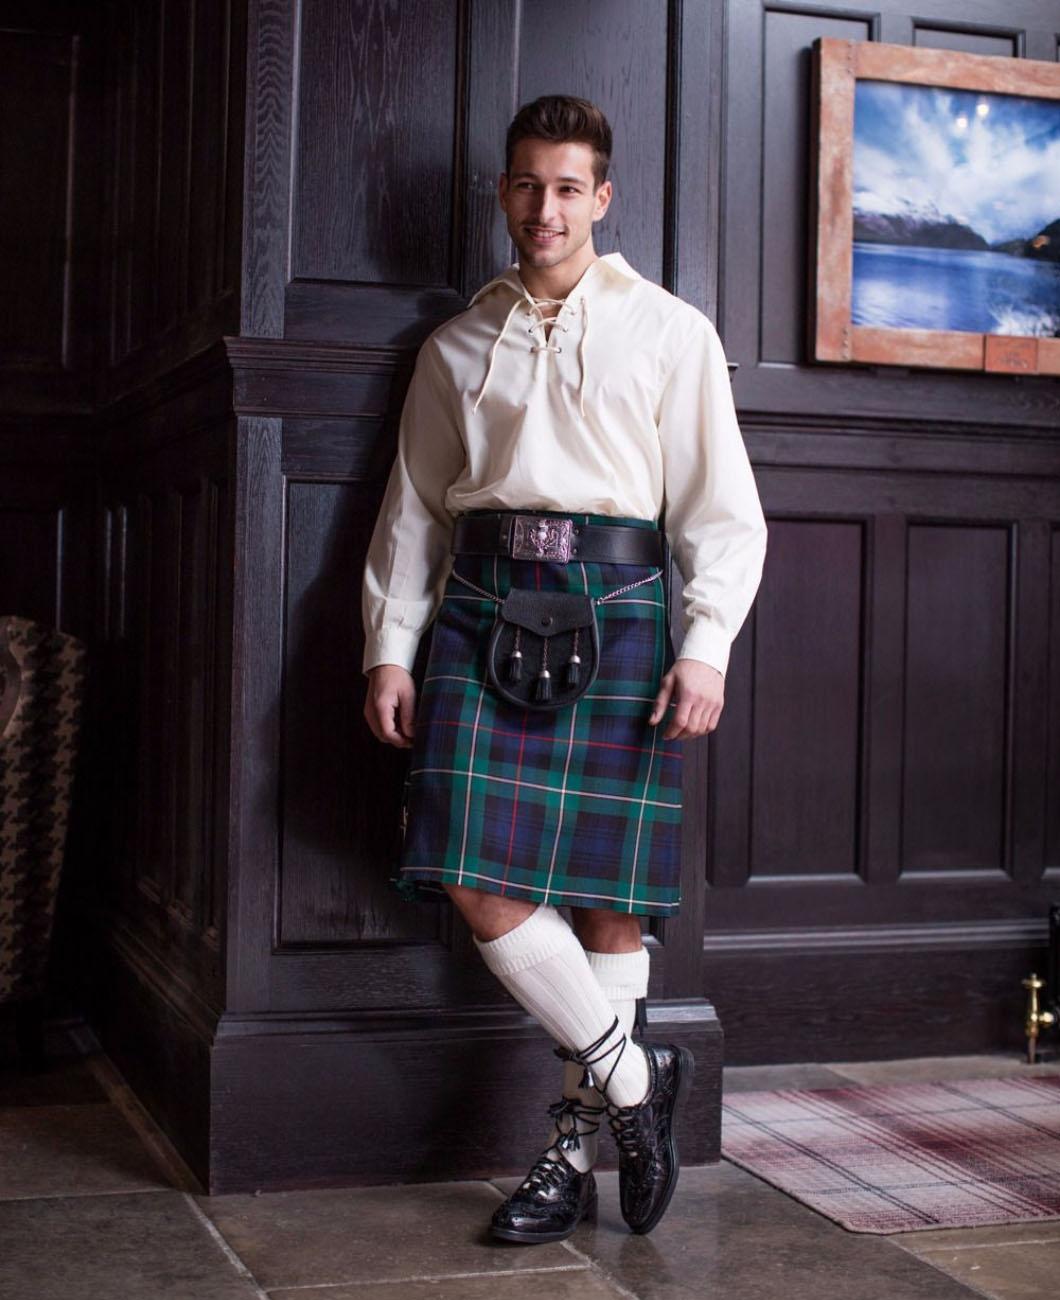 Traditional-Great-Kilt-skirt-latest-trend-vintage-scottish-scotland